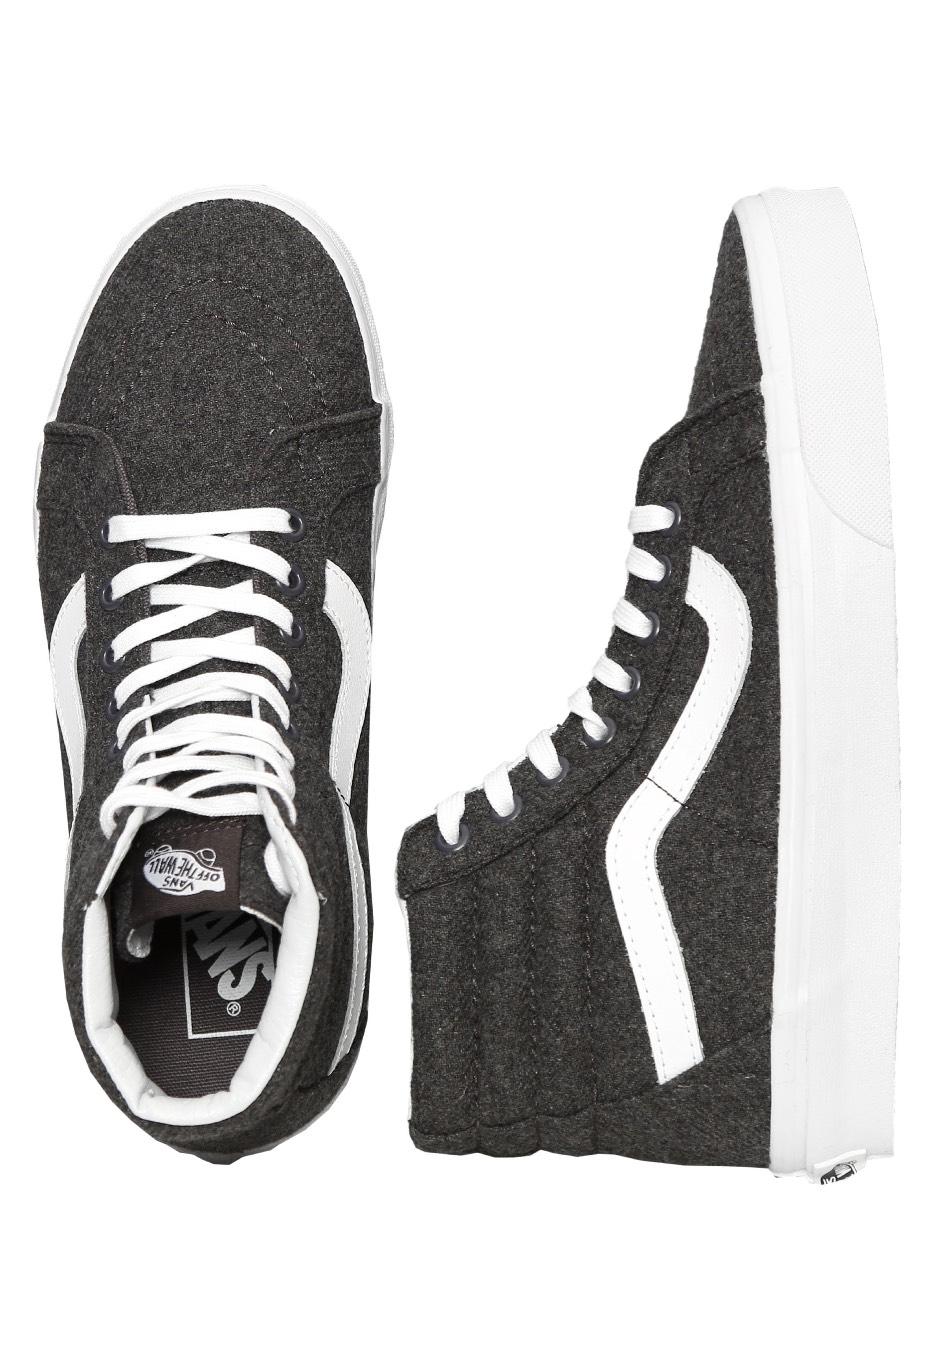 5561e4ea1dc072 Vans - Sk8-Hi Reissue Varsity Charcoal True White - Girl Shoes - Impericon.com  UK